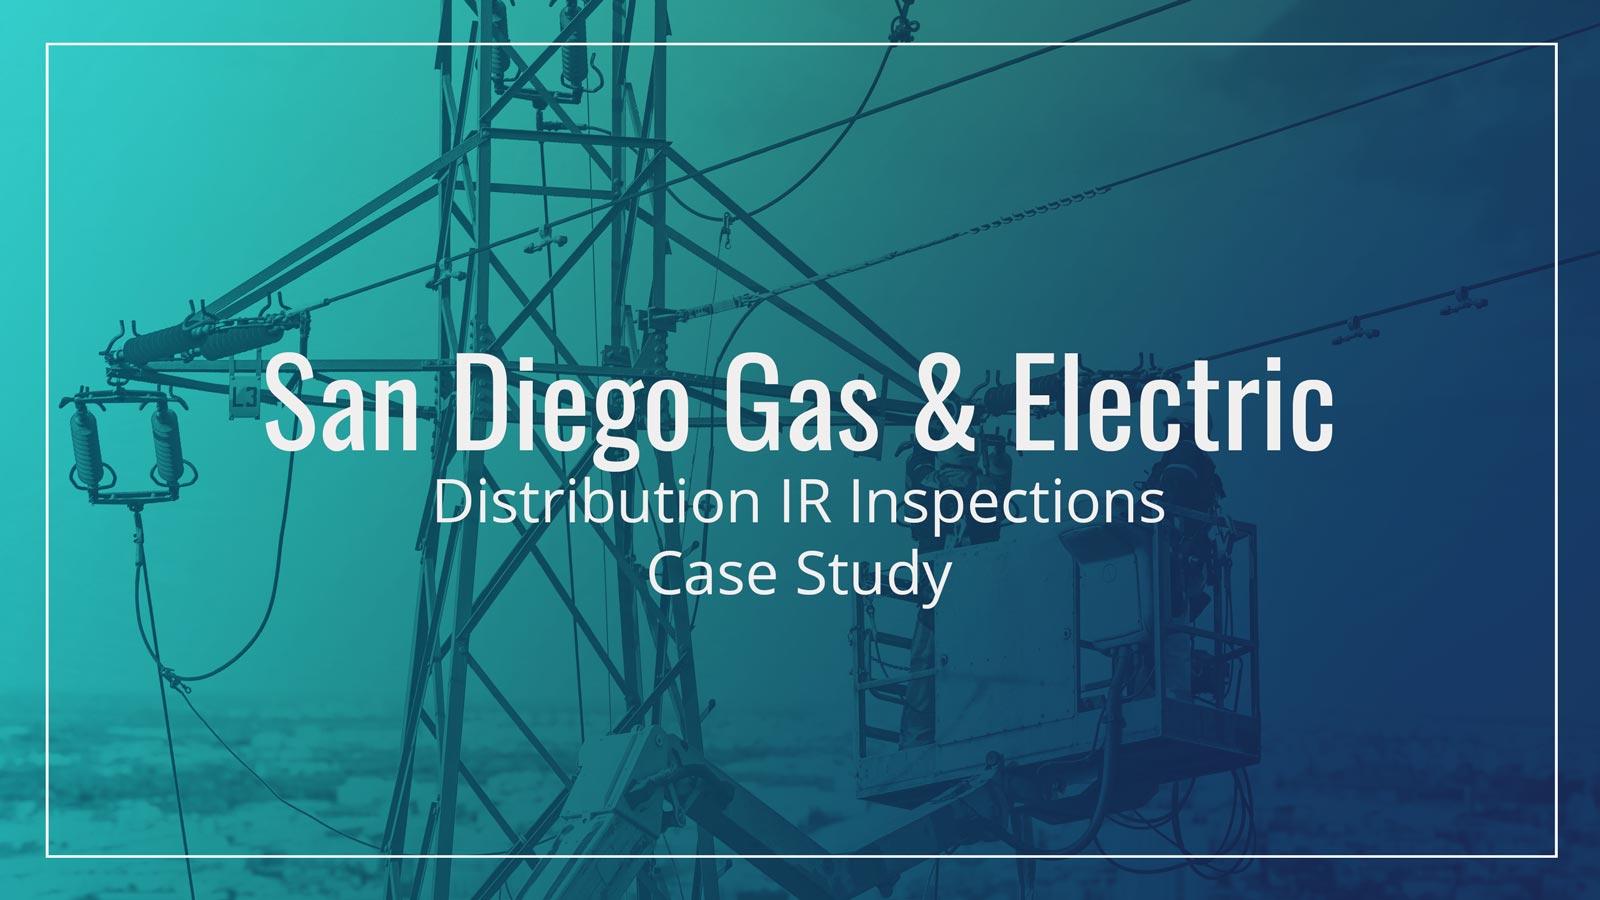 San Diego Gas & Electric – Distribution IR Inspections